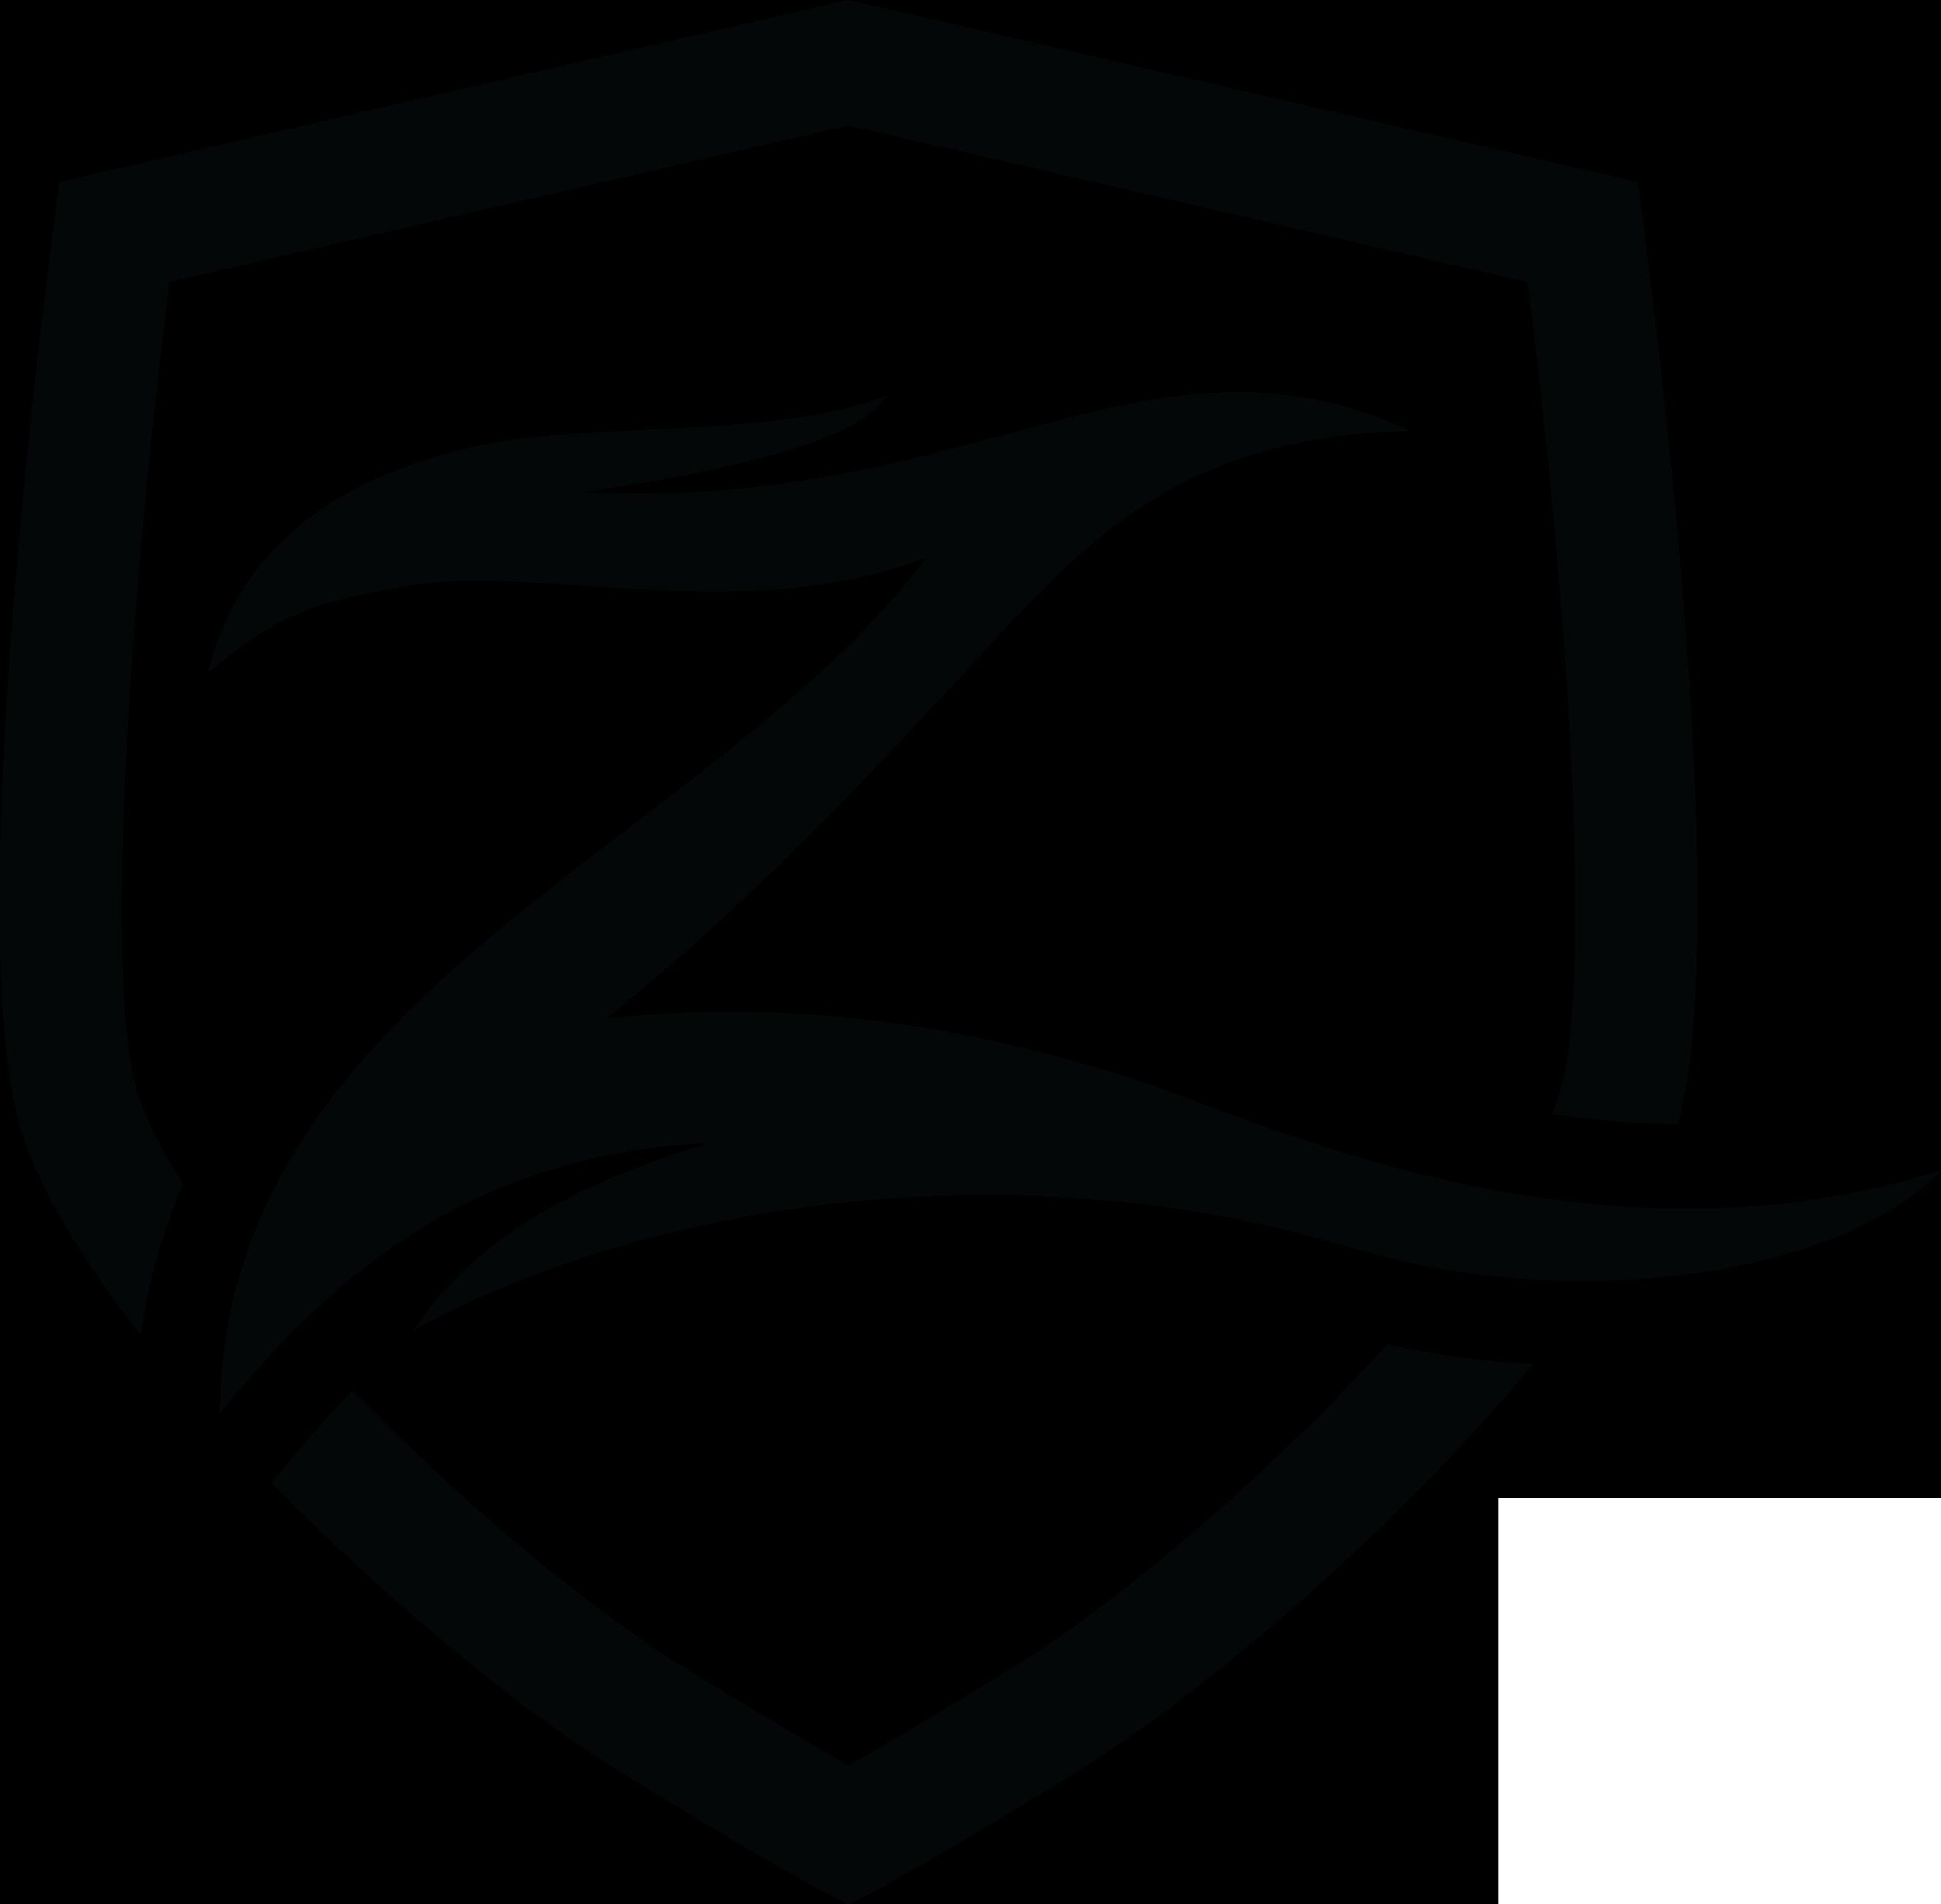 Zone-5a